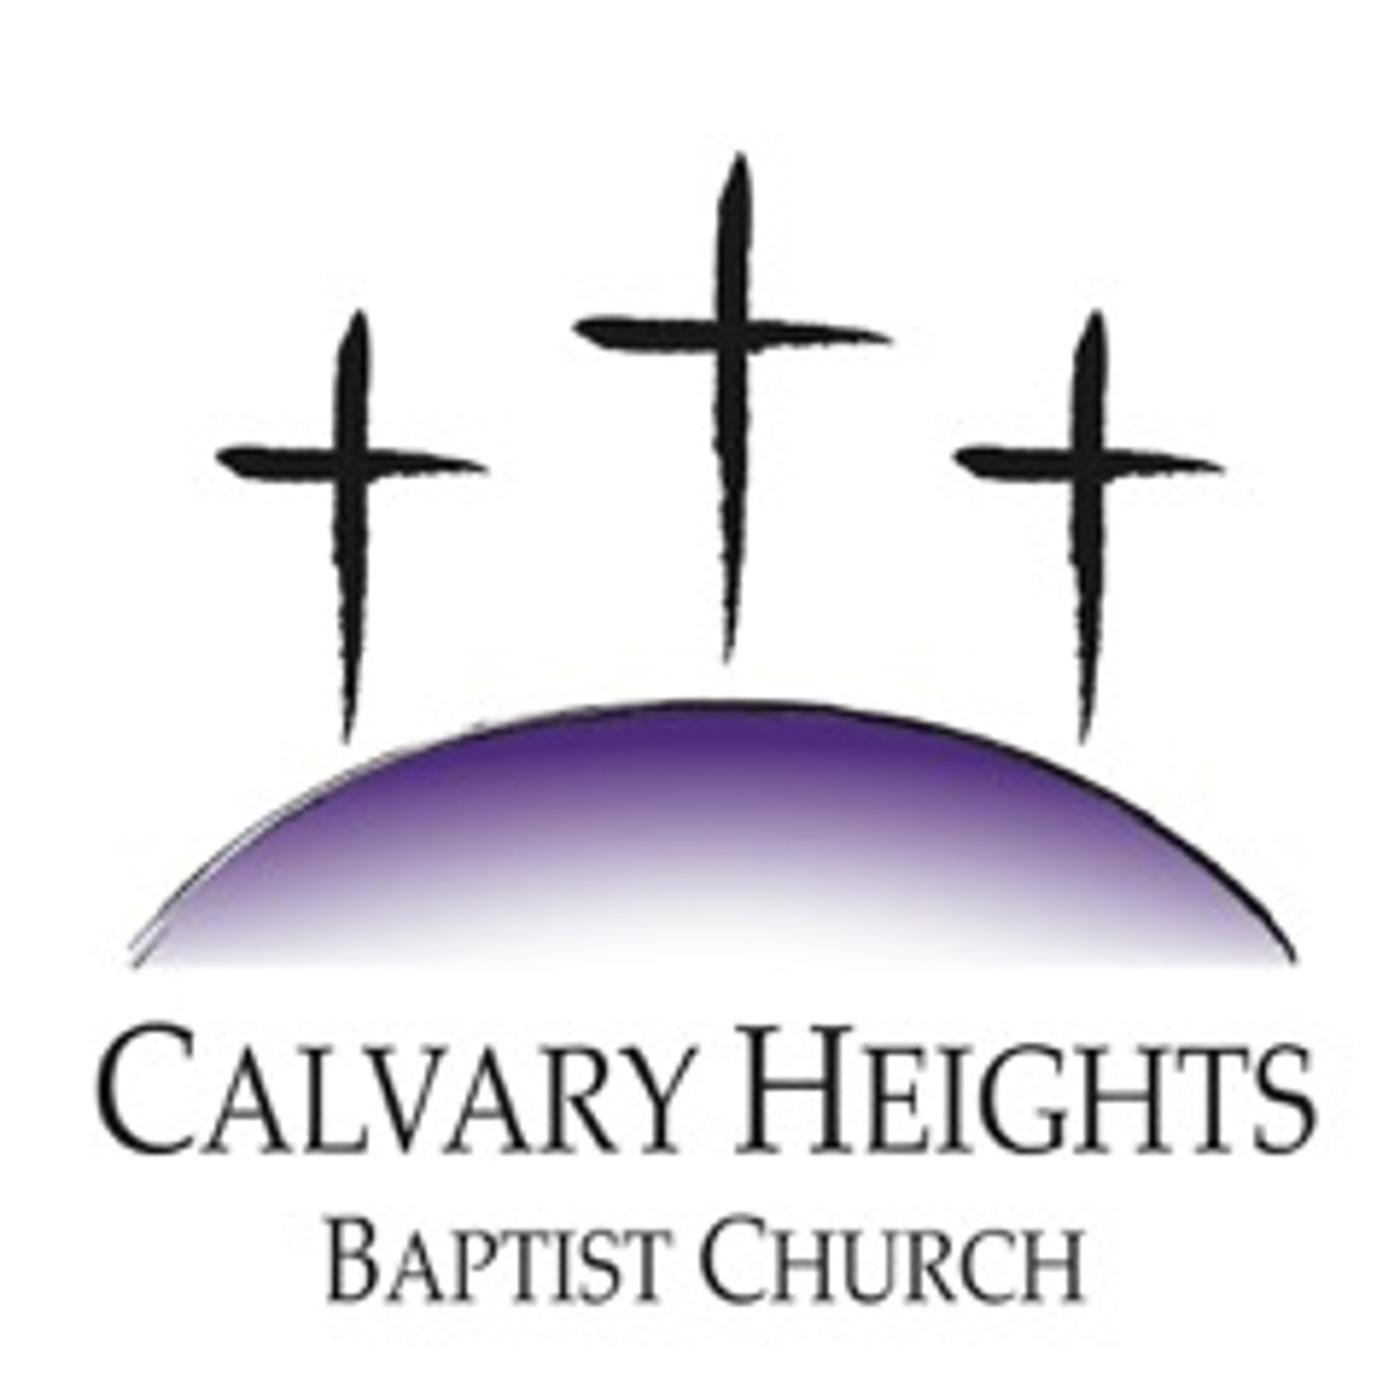 Calvary Heights Baptist Church of Martinsville, IN